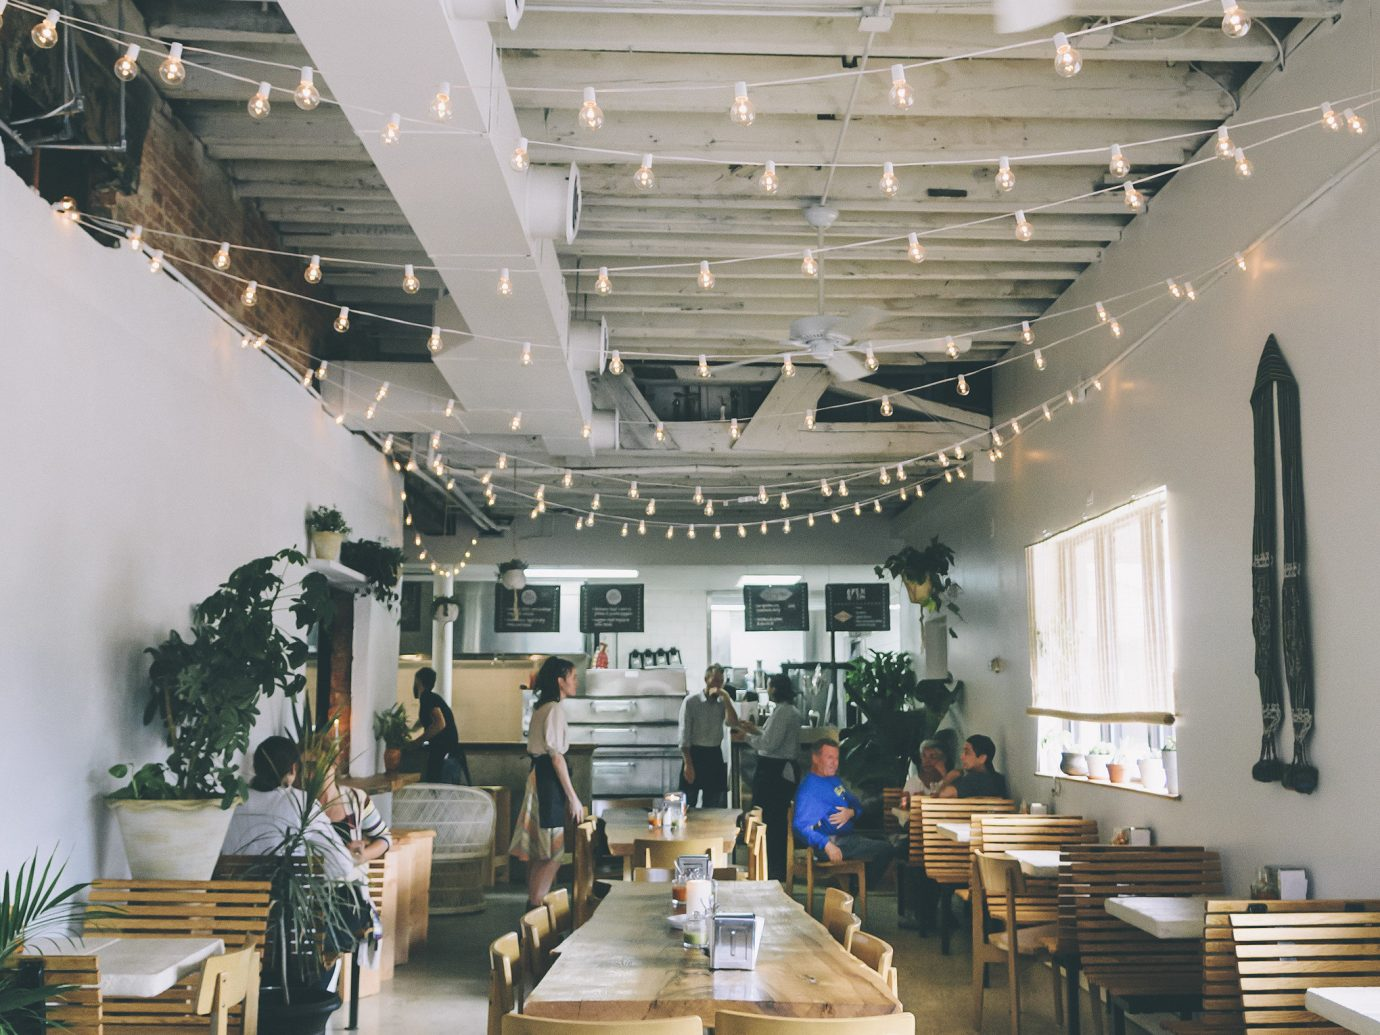 Food + Drink indoor floor room chair interior design ceiling Living restaurant daylighting table furniture